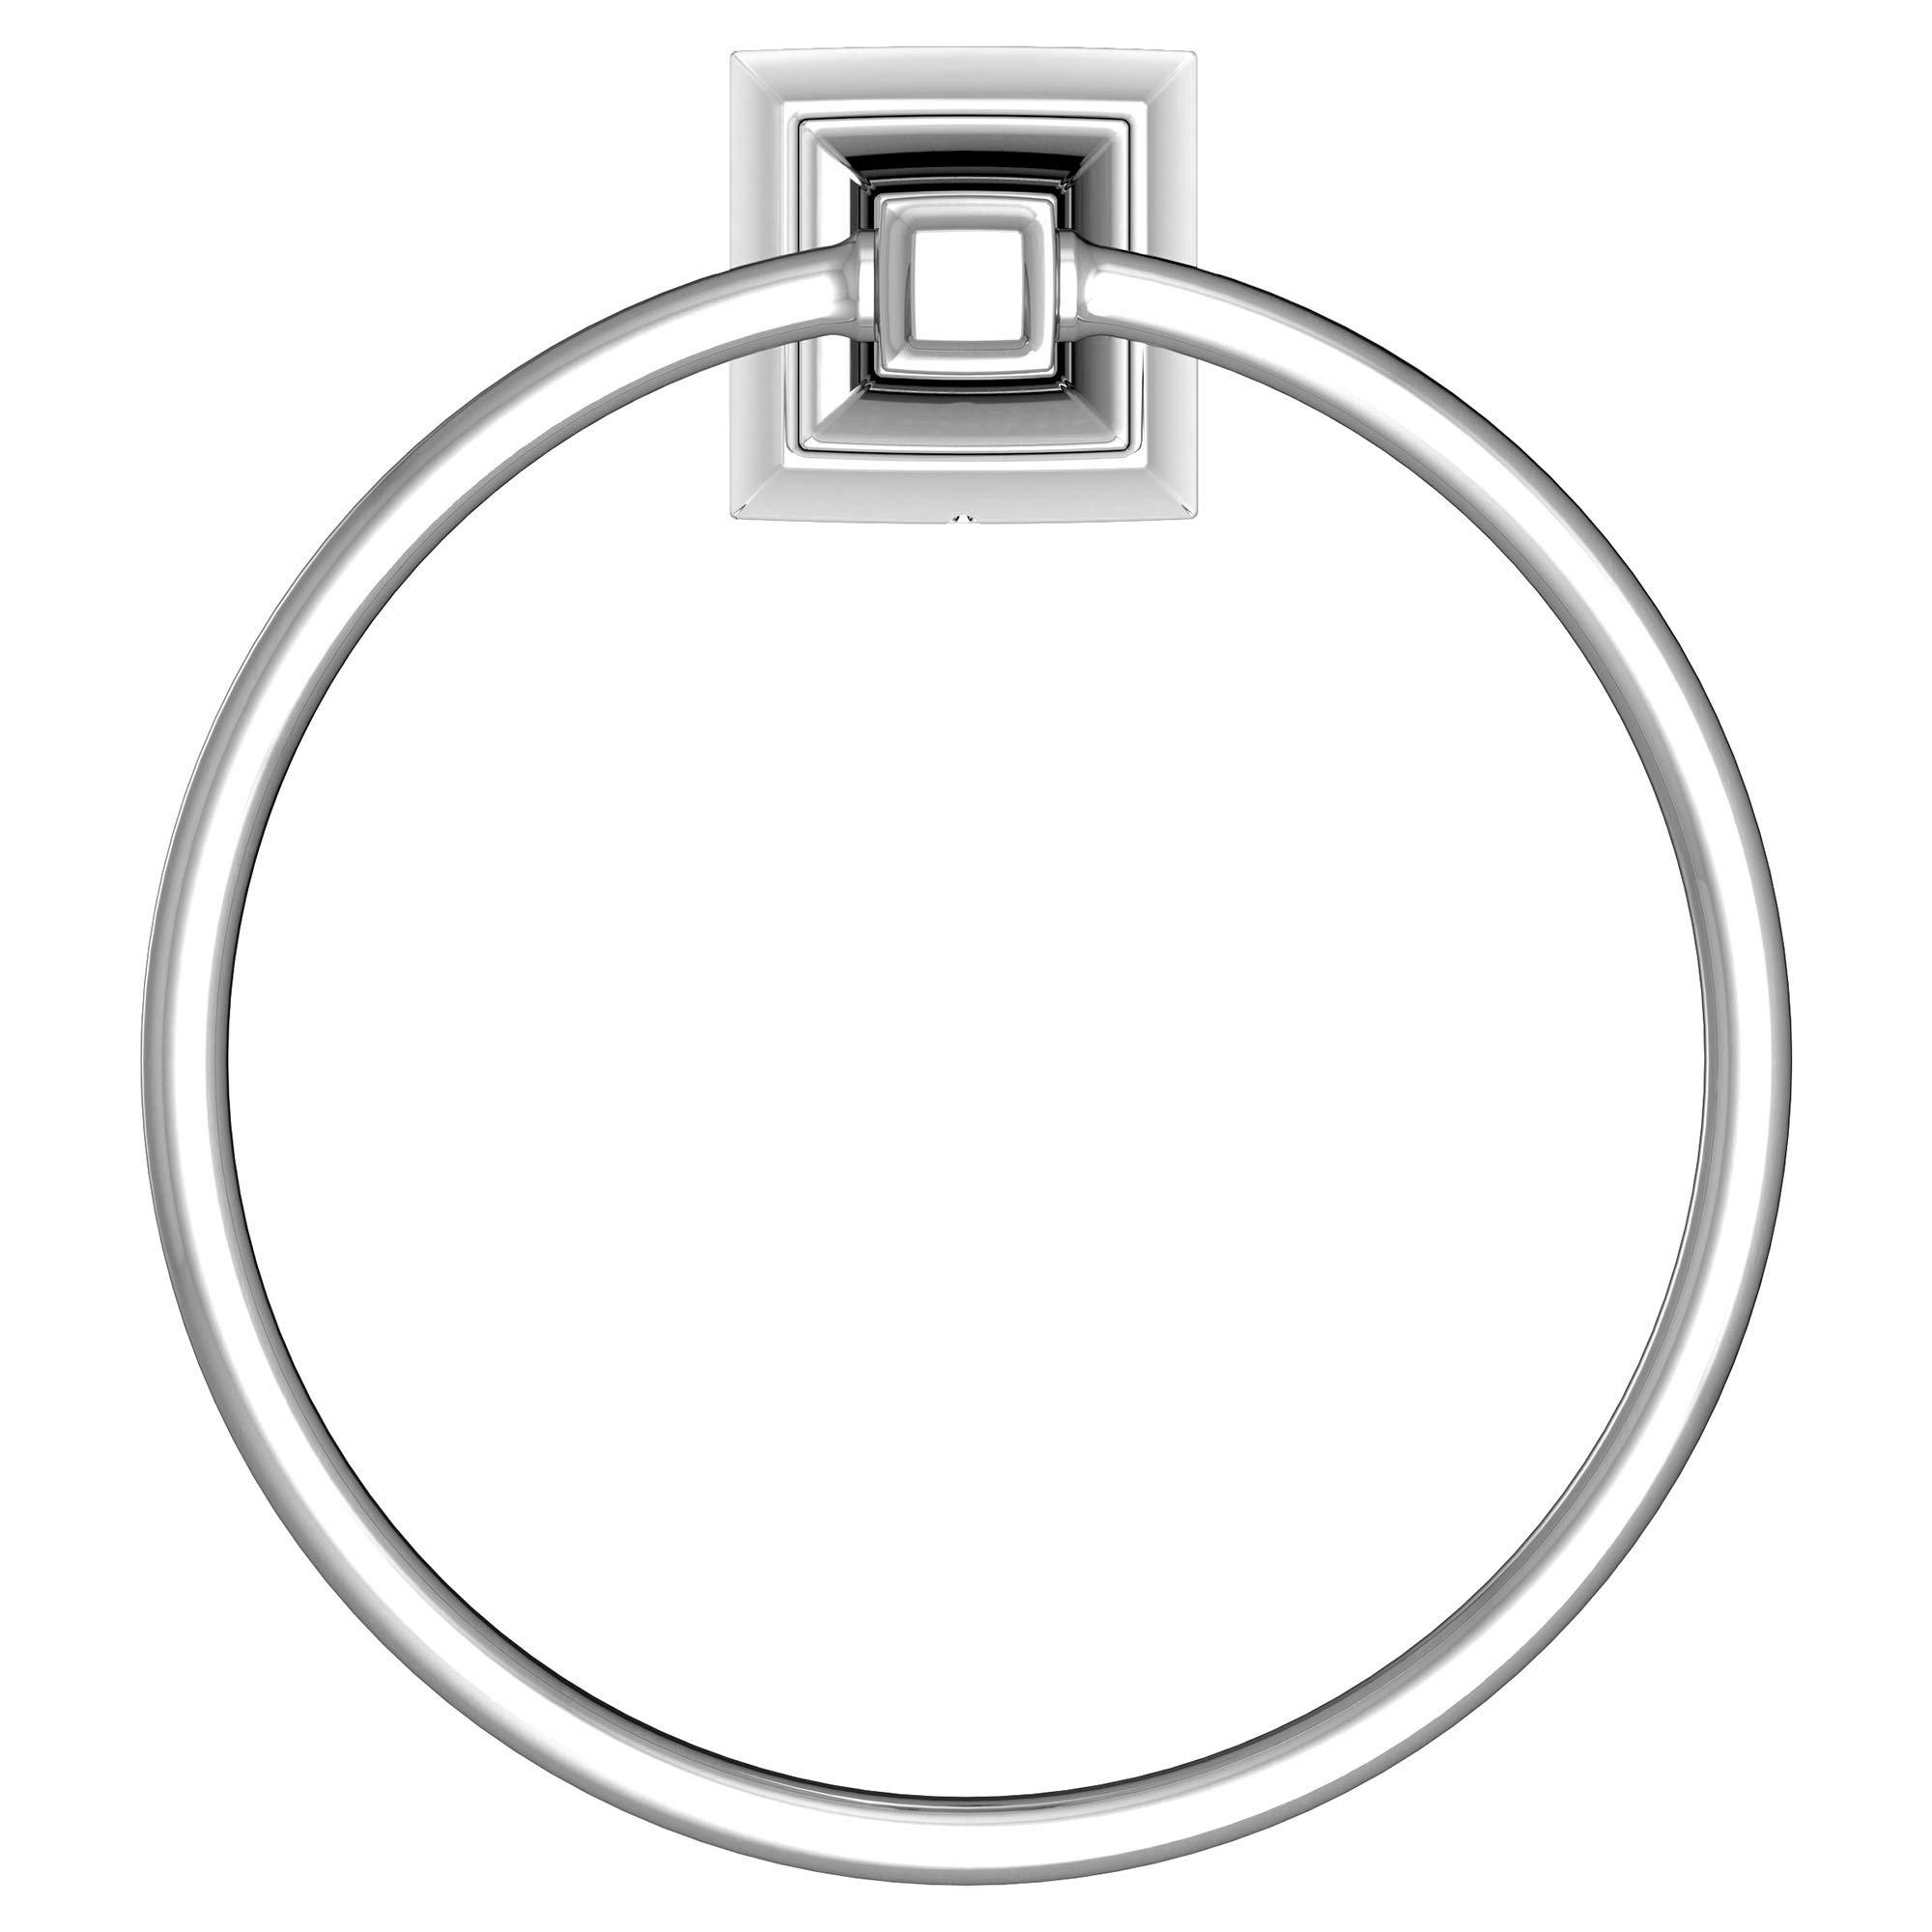 American Standard 7455190.002 TS Series Towel Ring, Polished Chrome